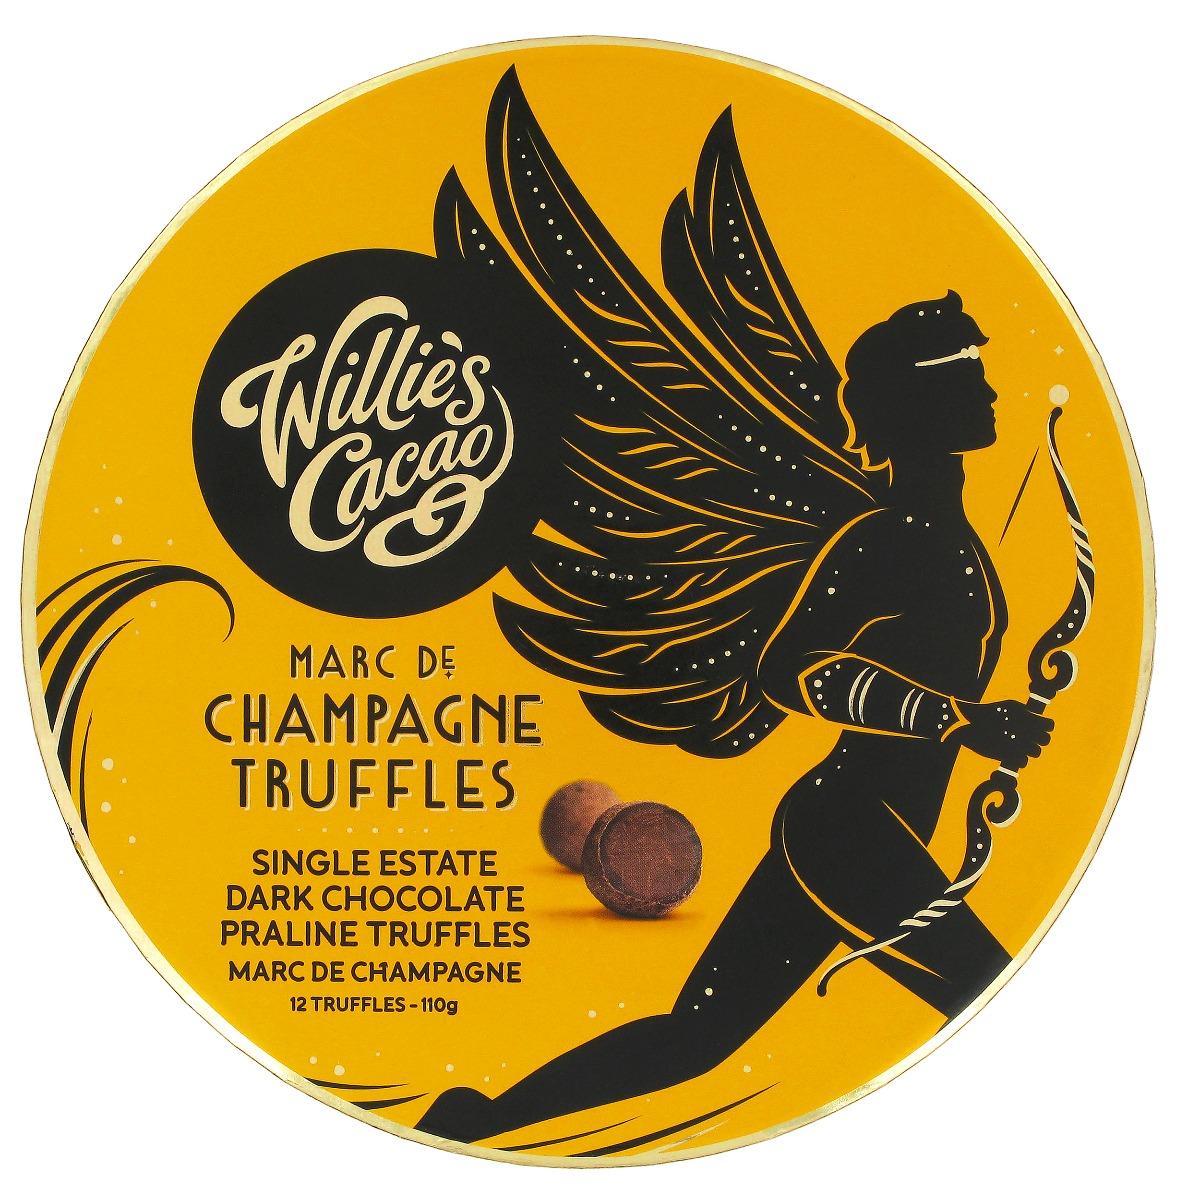 Dark chocolate Praline truffles with Champagne